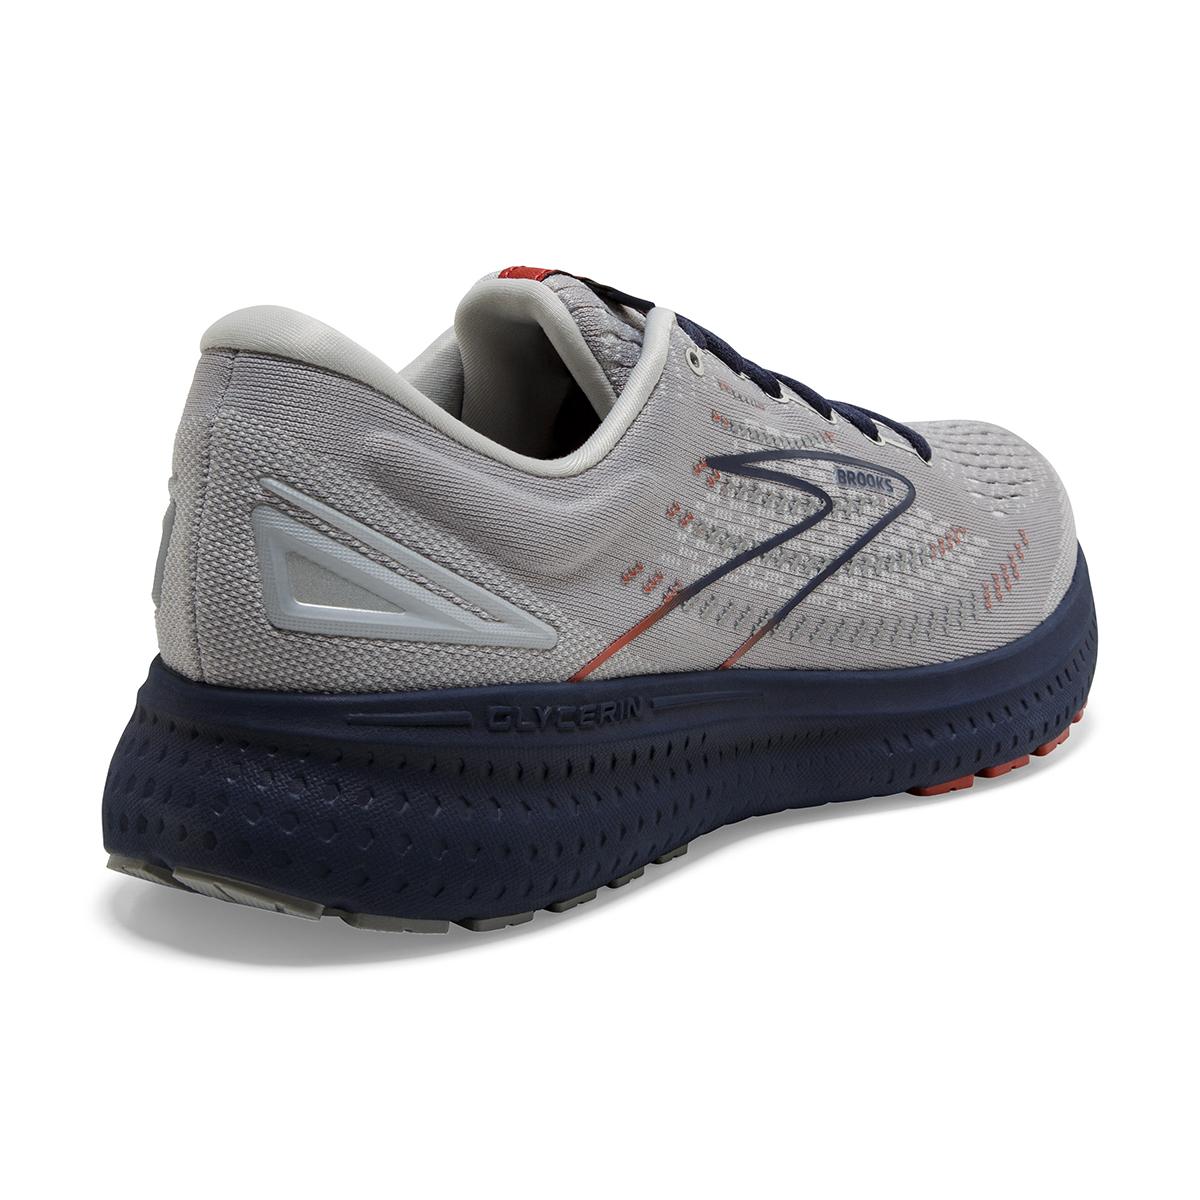 Men's Brooks Glycerin 19 Running Shoe - Color: Grey/Alloy/Peacoat - Size: 7 - Width: Regular, Grey/Alloy/Peacoat, large, image 4